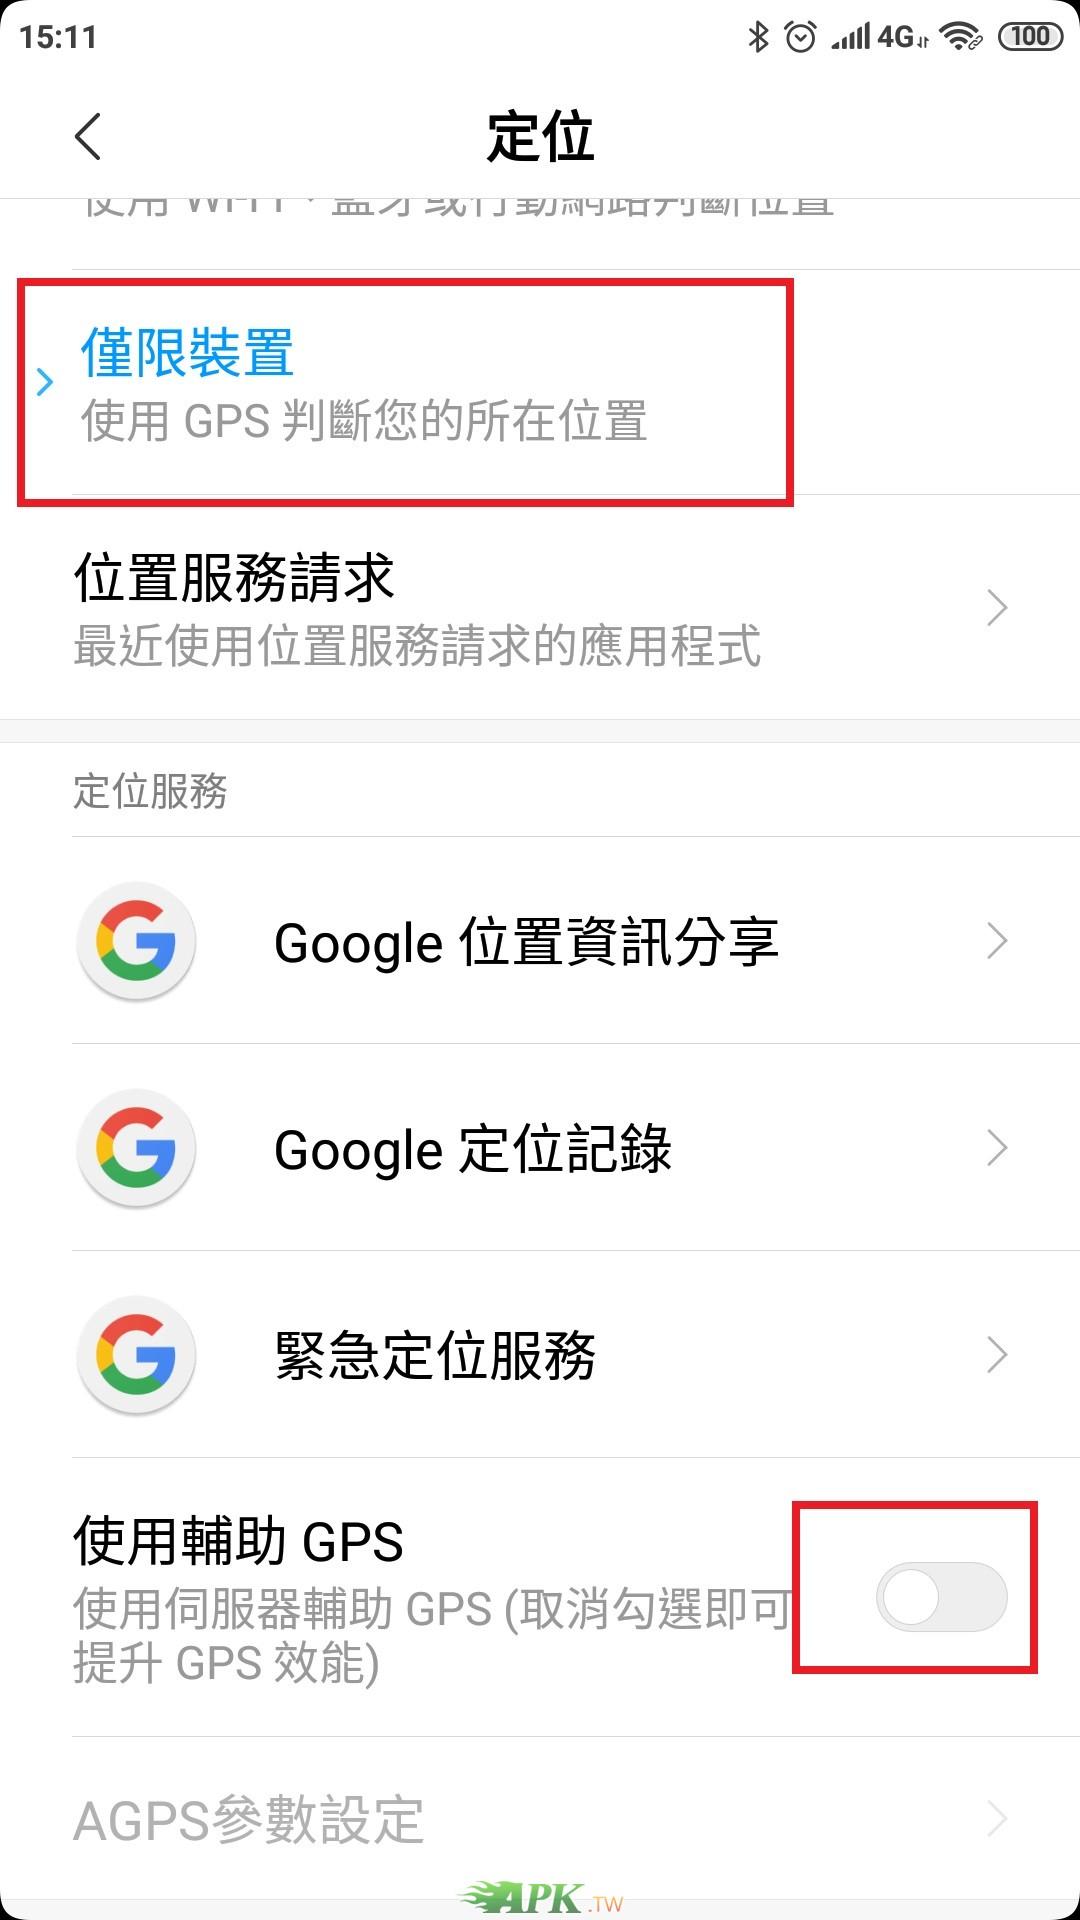 Screenshot_2019-07-17-15-11-14-292_com.android.settings.jpg